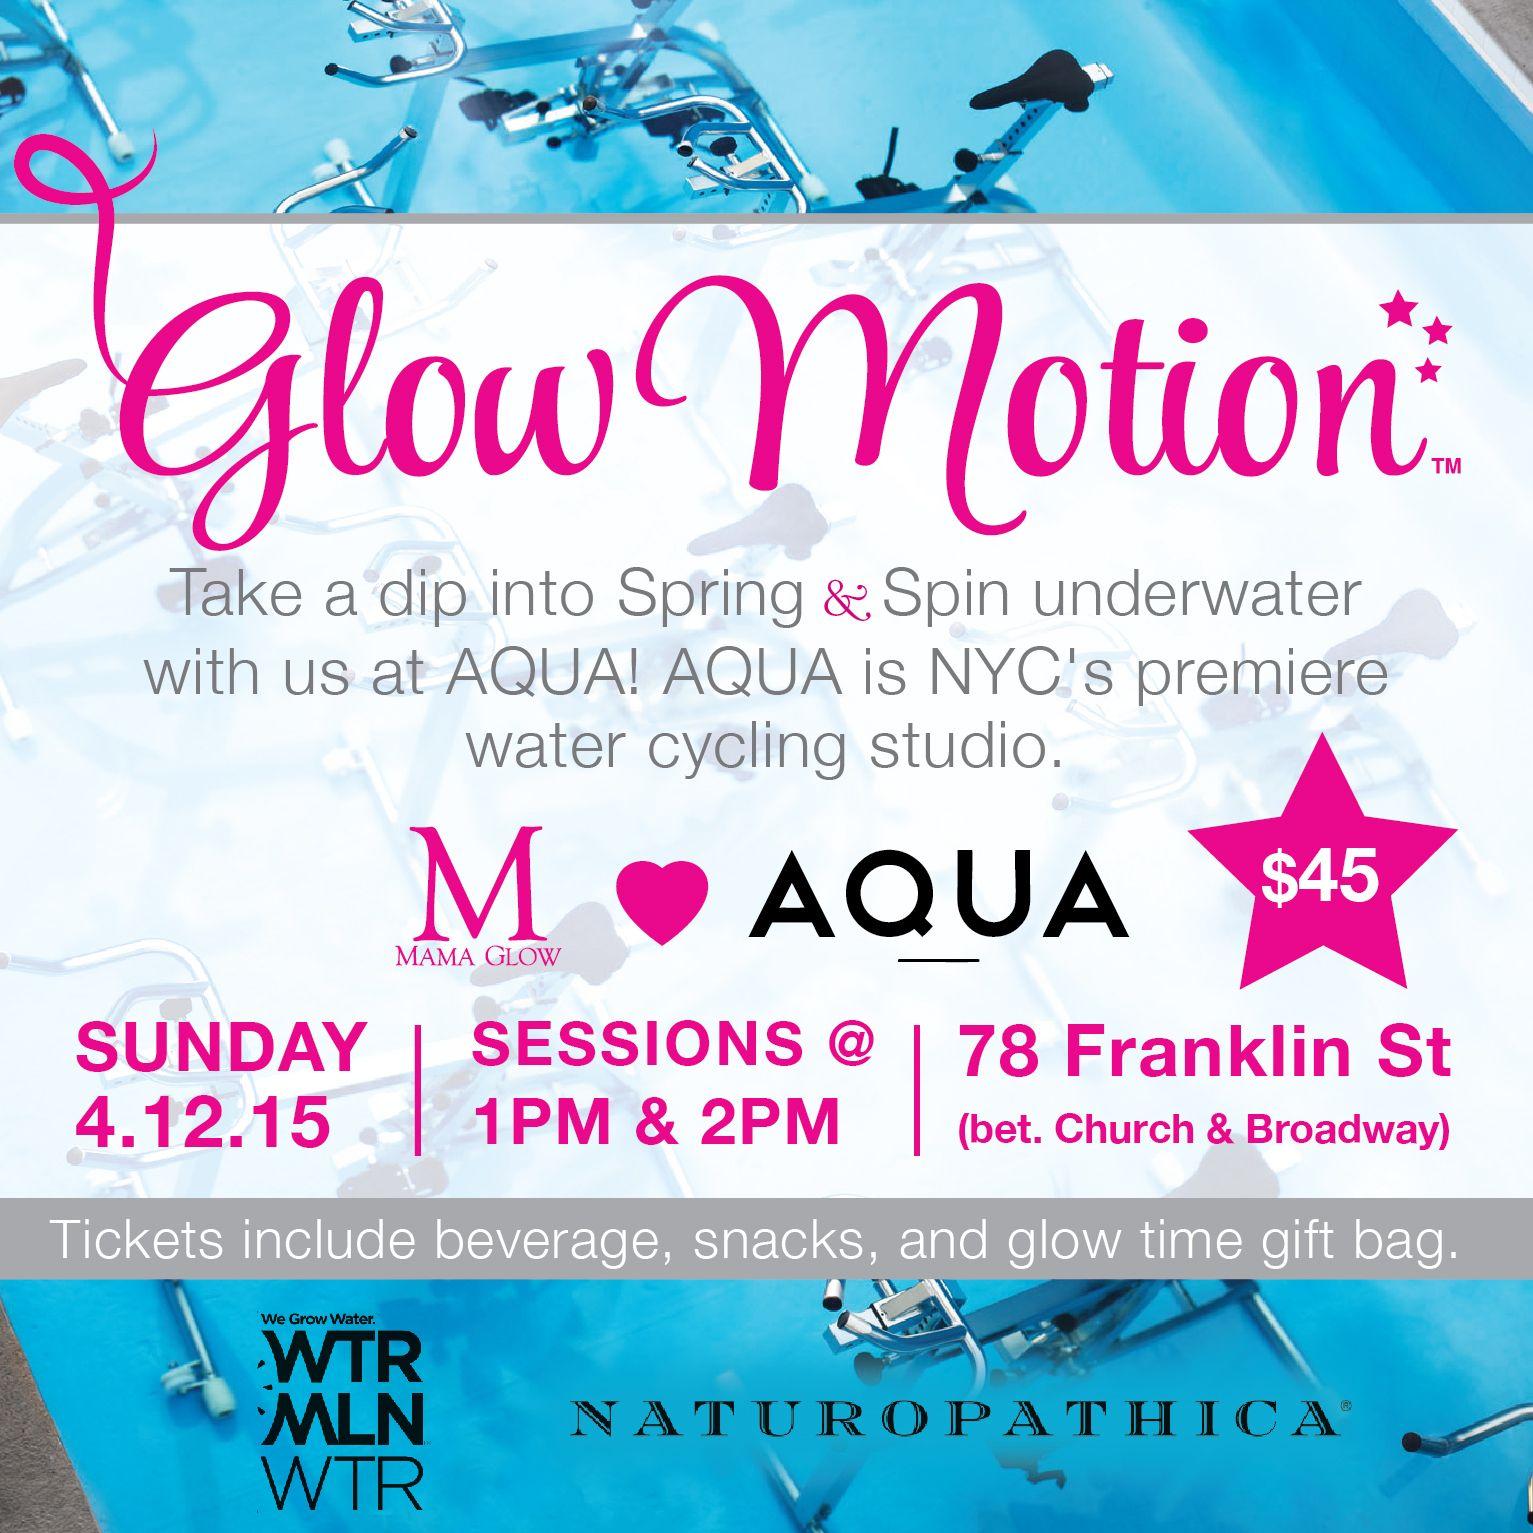 April 12th glow motion mama glow loves aqua motion